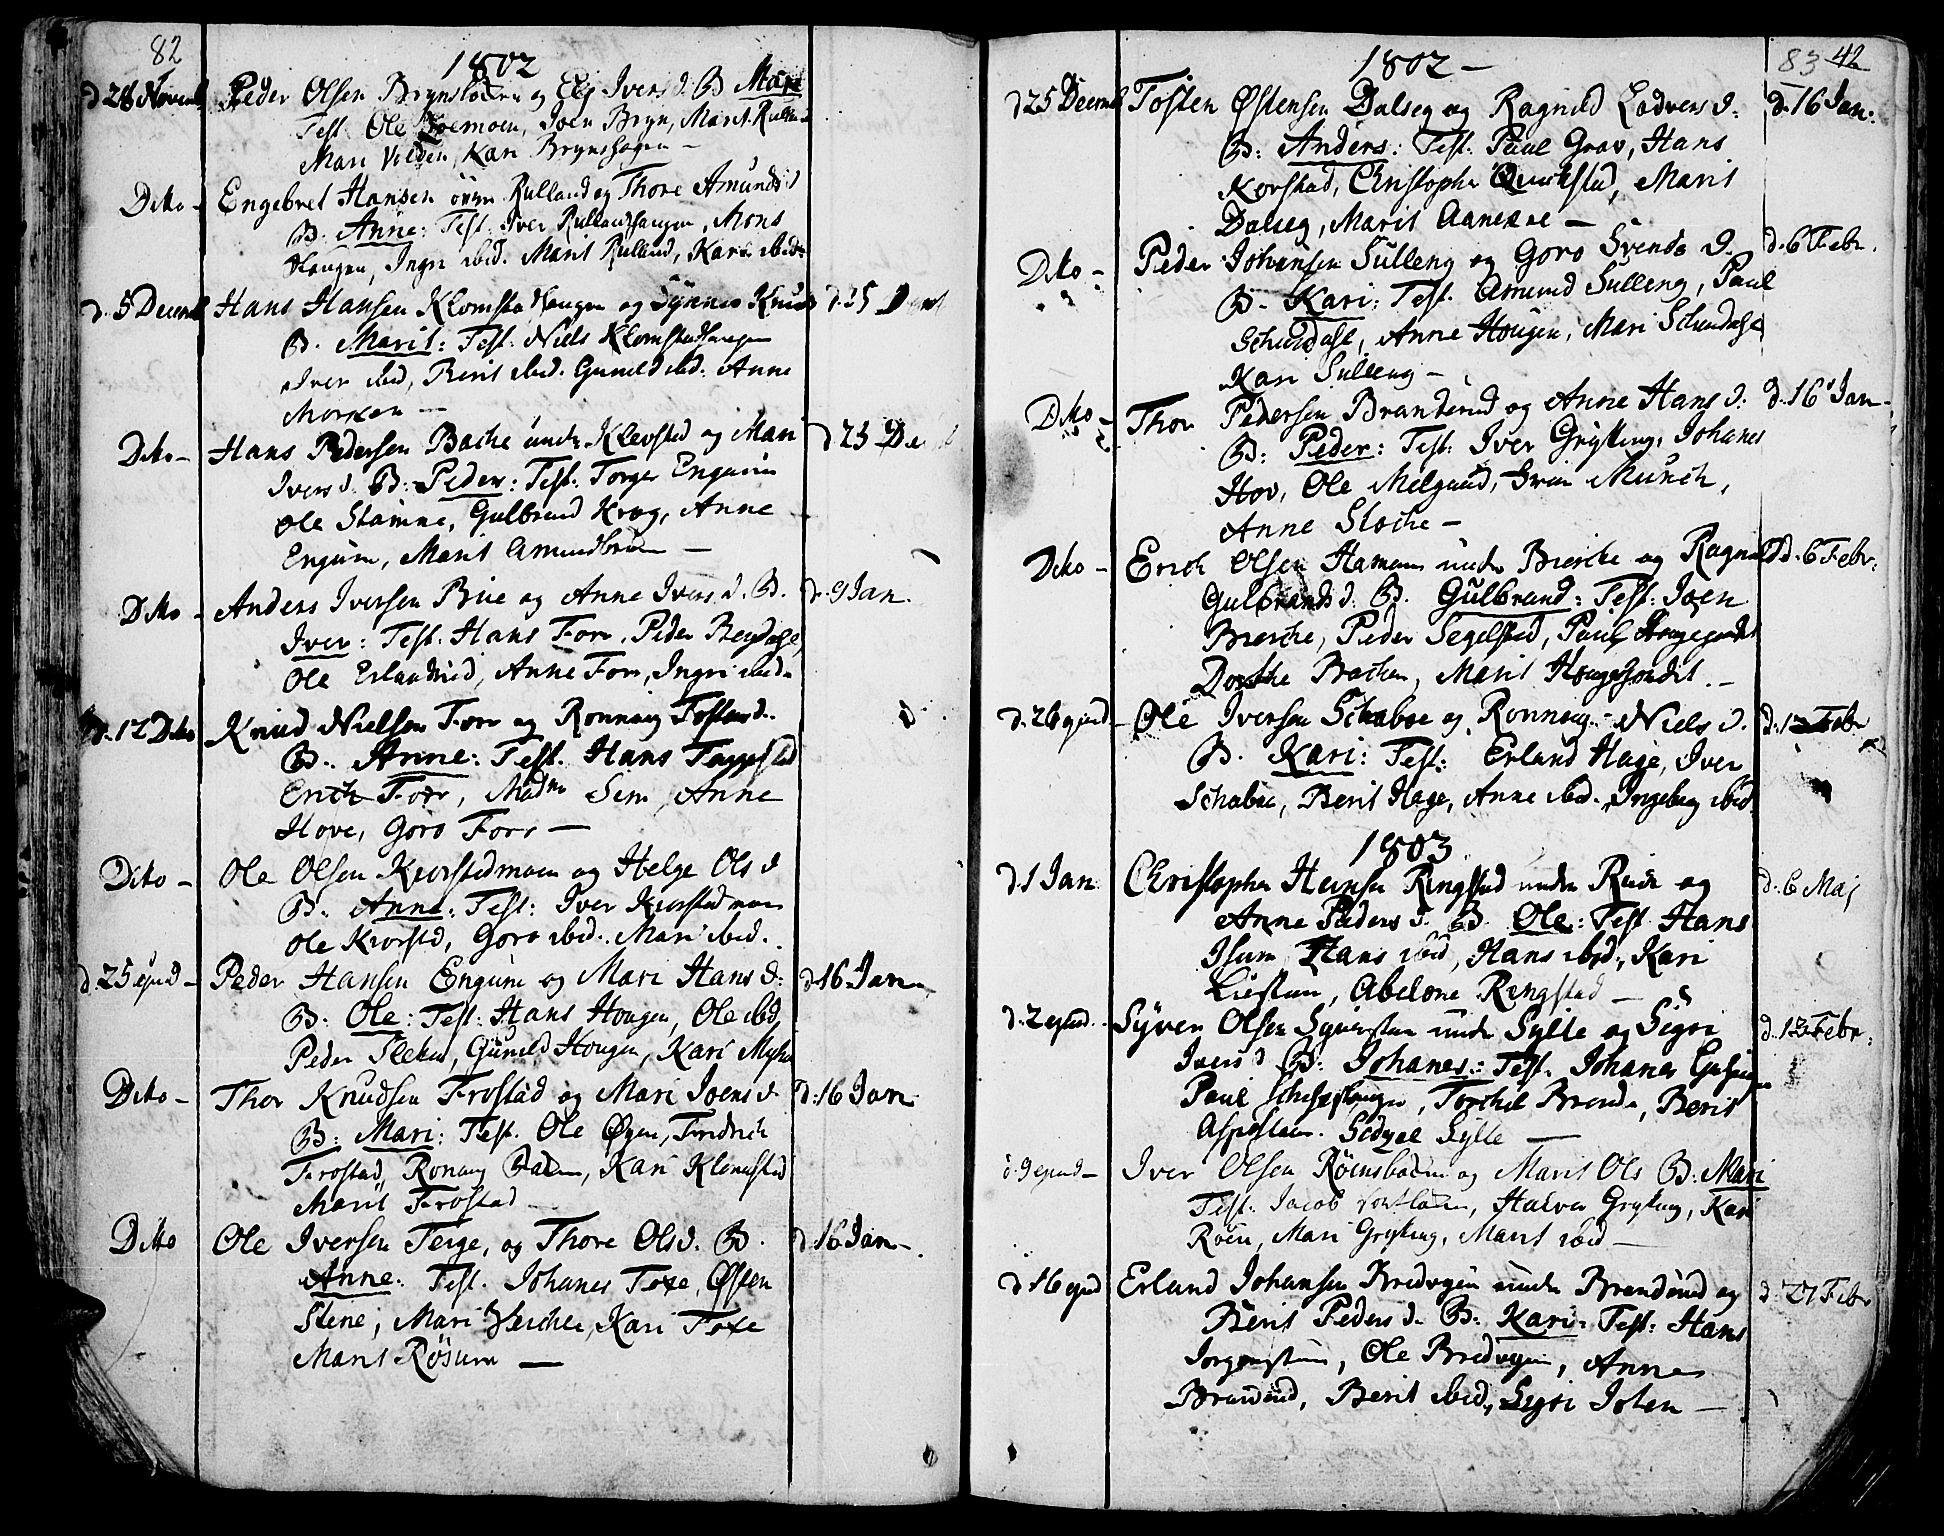 SAH, Fron prestekontor, H/Ha/Haa/L0001: Ministerialbok nr. 1, 1799-1816, s. 82-83